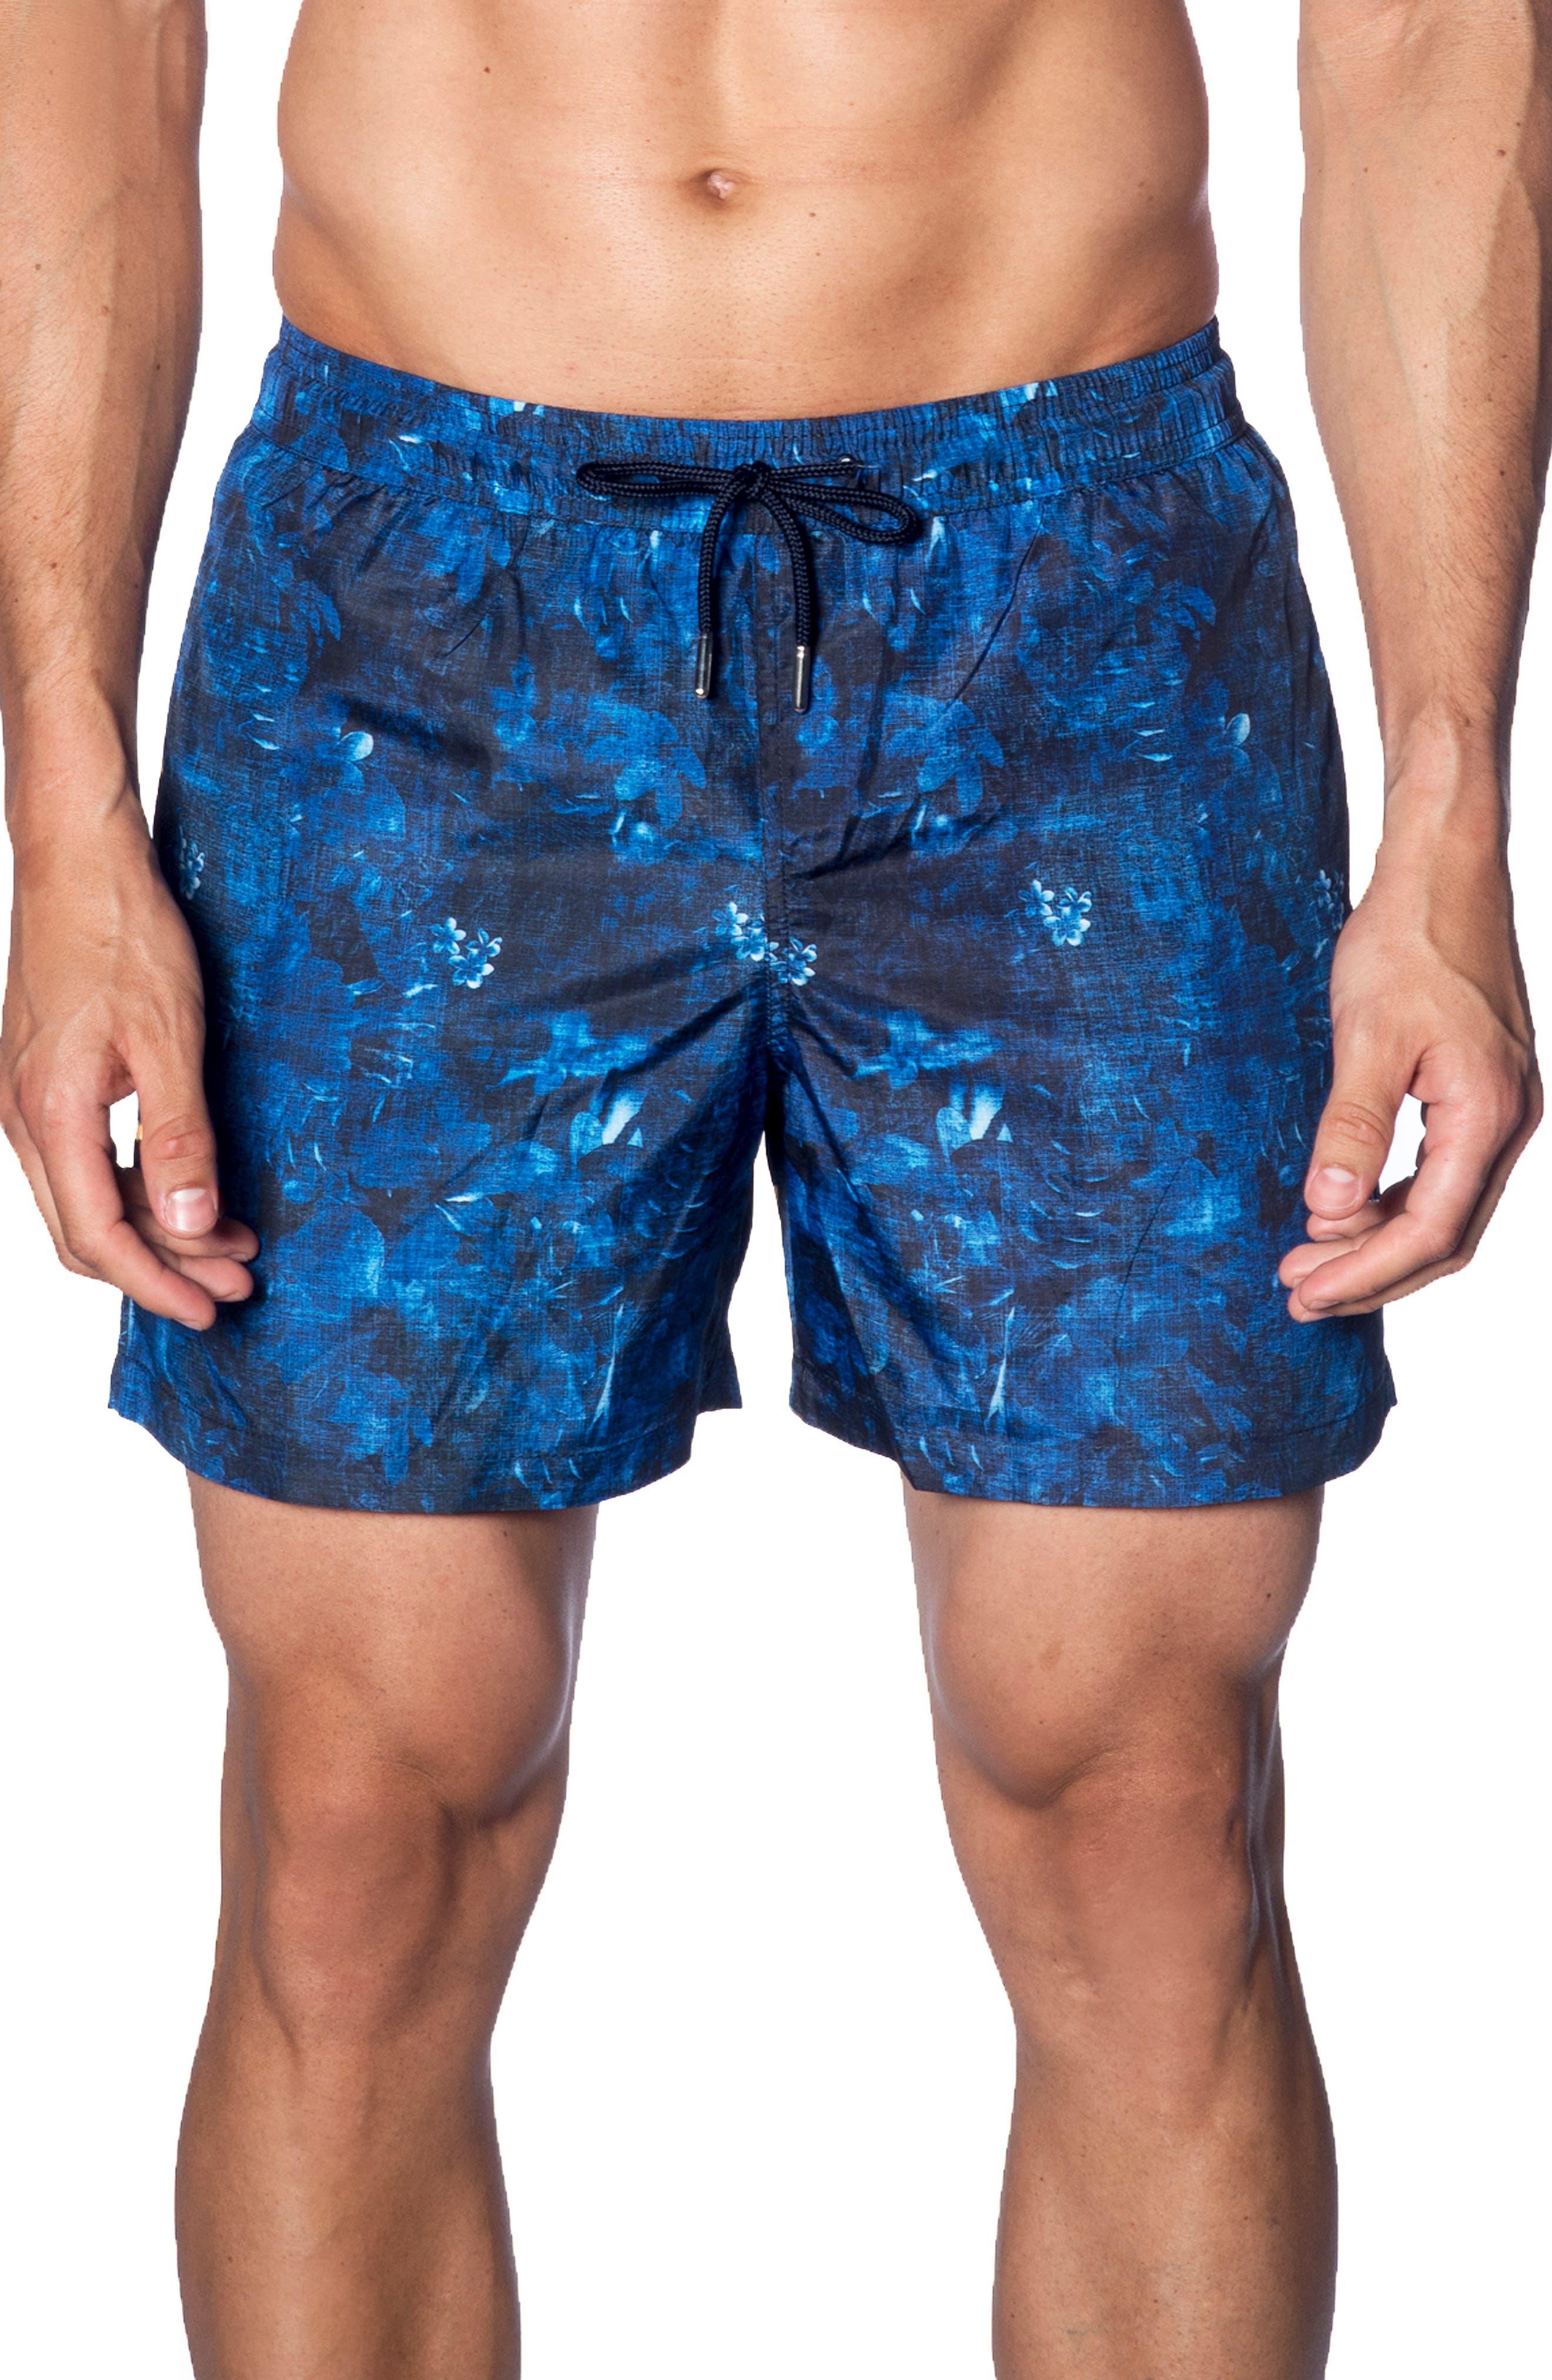 Jared Lang Swim Trunks, Blue